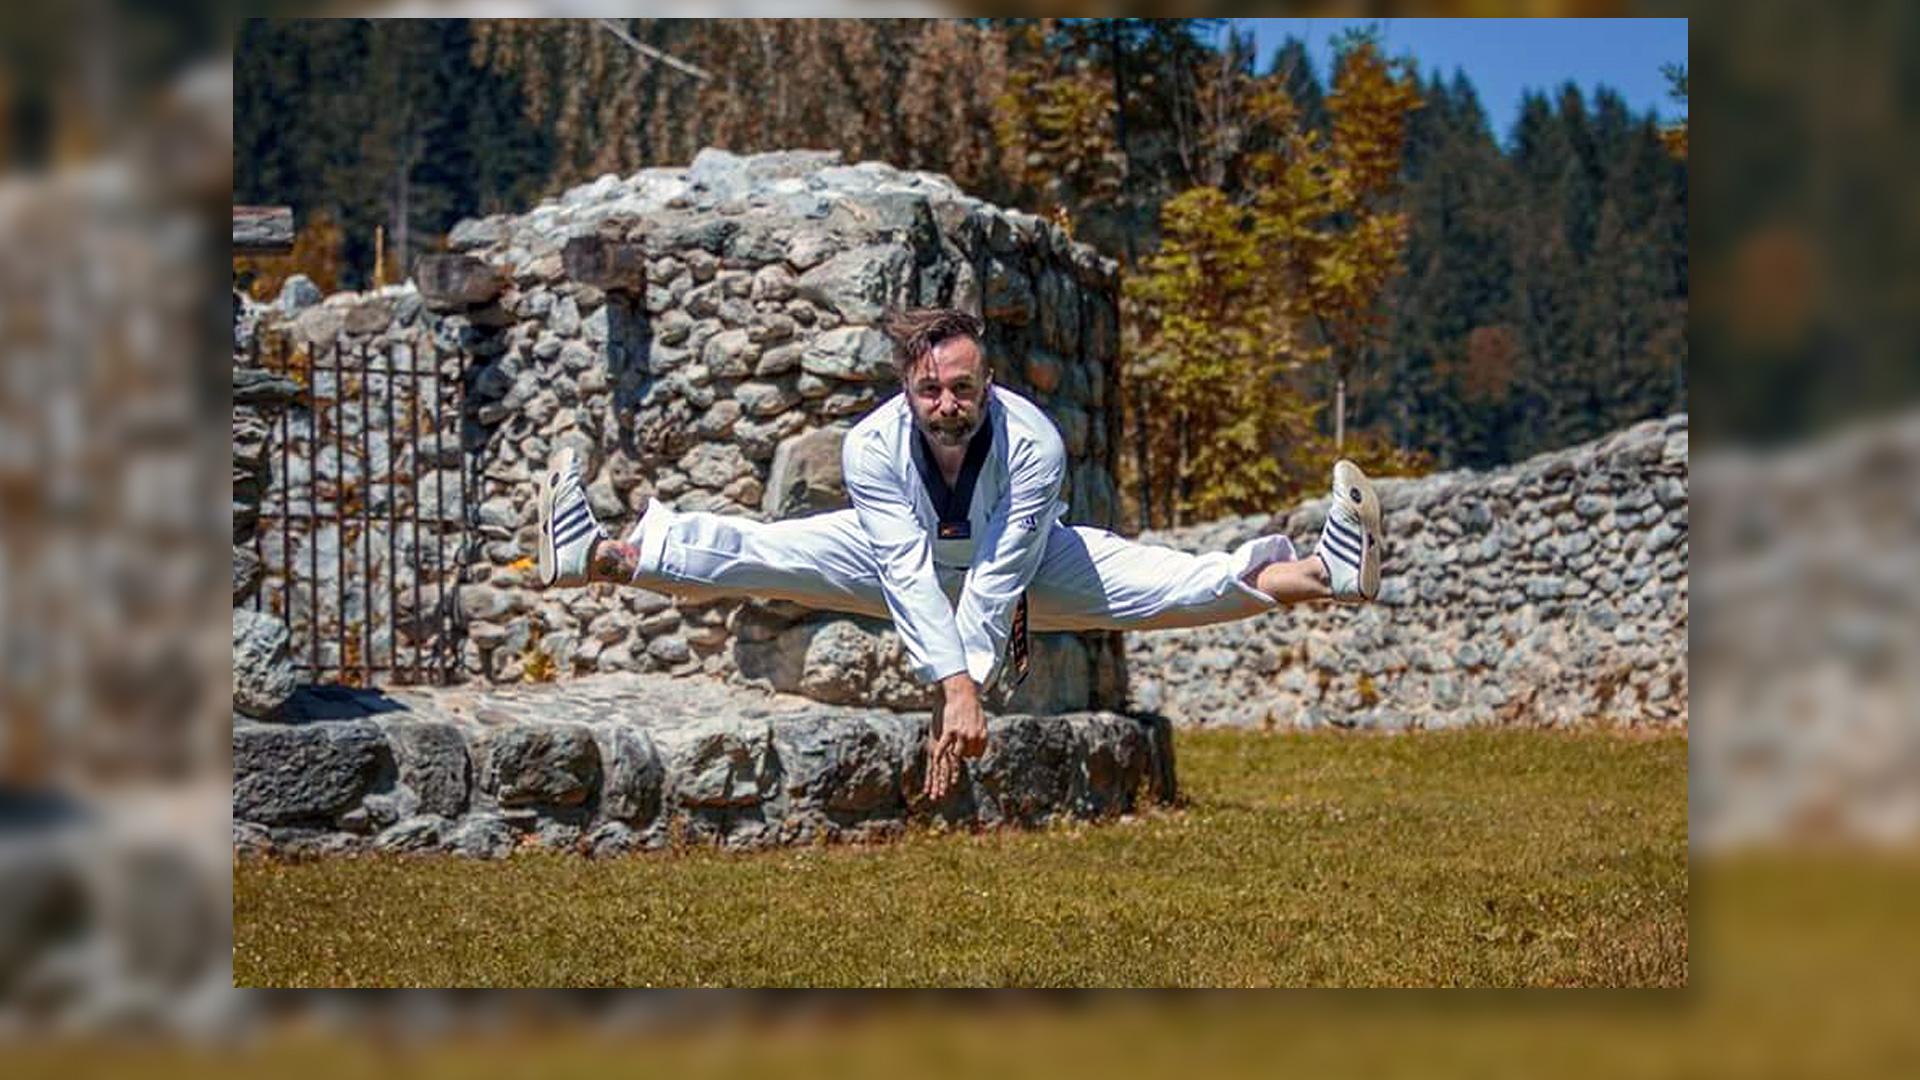 Taekwondo Sportler im Freien, Spagat